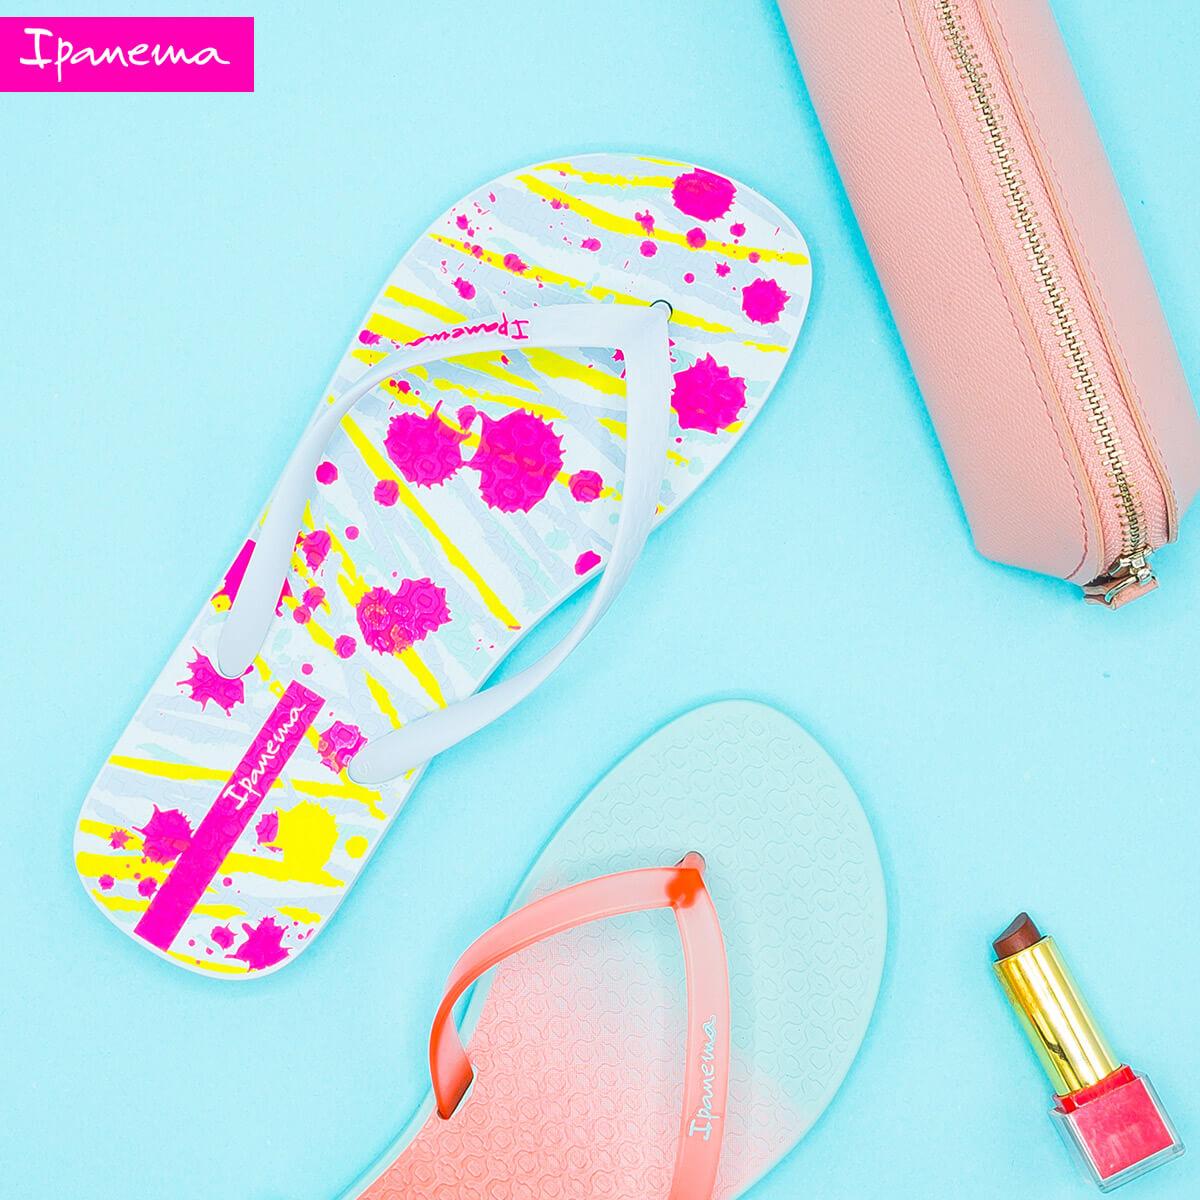 Ipanema Flip Flops Slippers Go Beyond the Ordinary